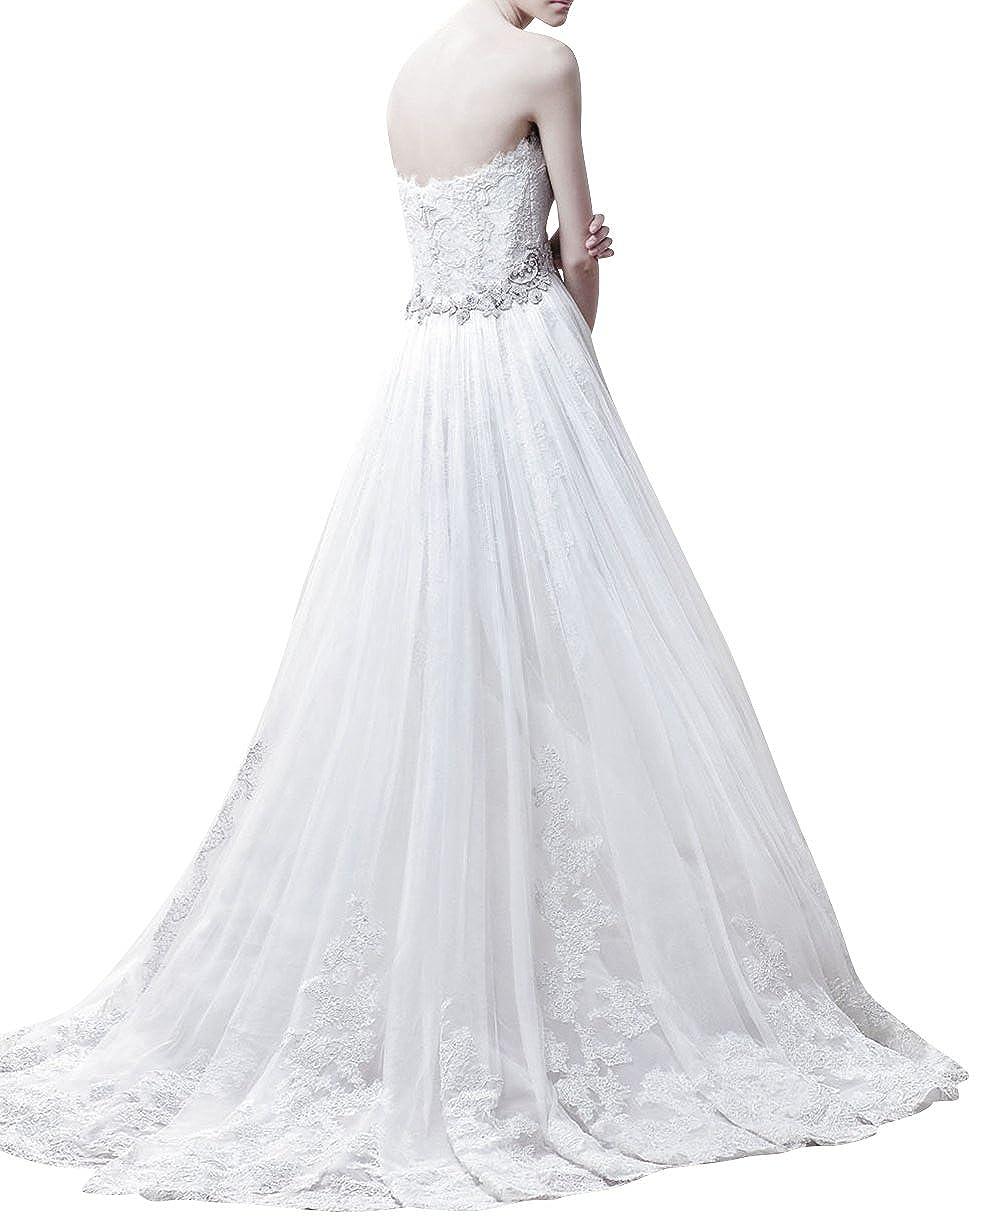 Dapene Womens Lace Sweetheart Sleeveless Train A Line Bridal Wedding Dress